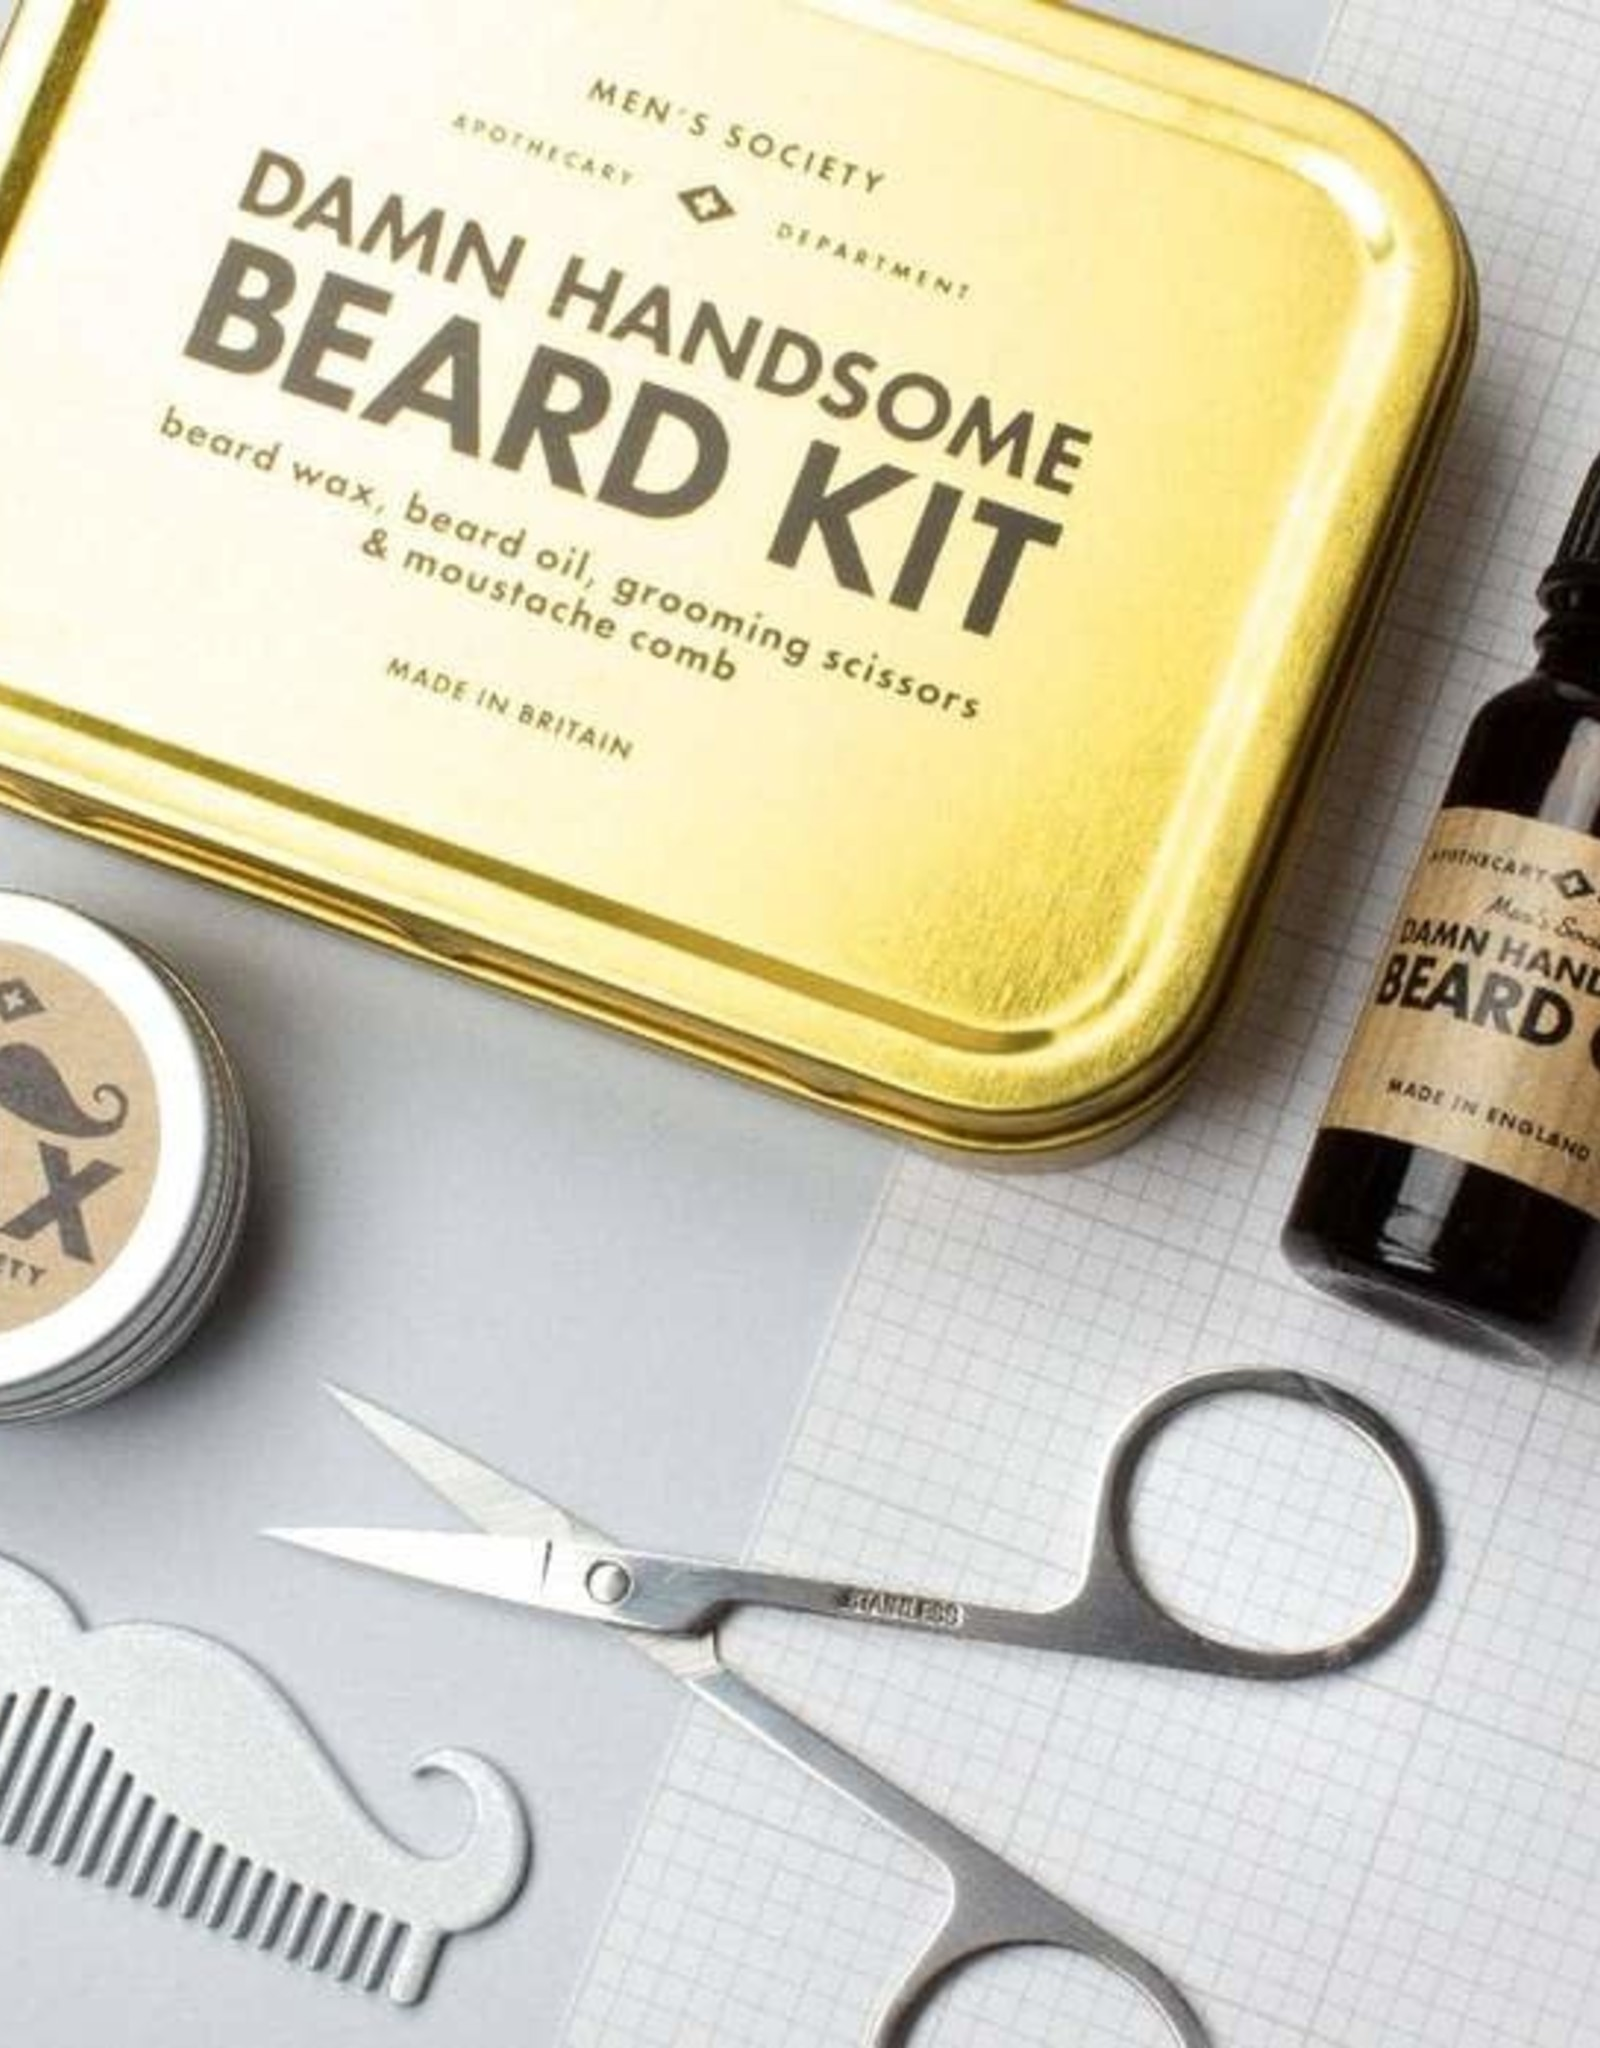 M-Soc Damn Handsome Beard Kit